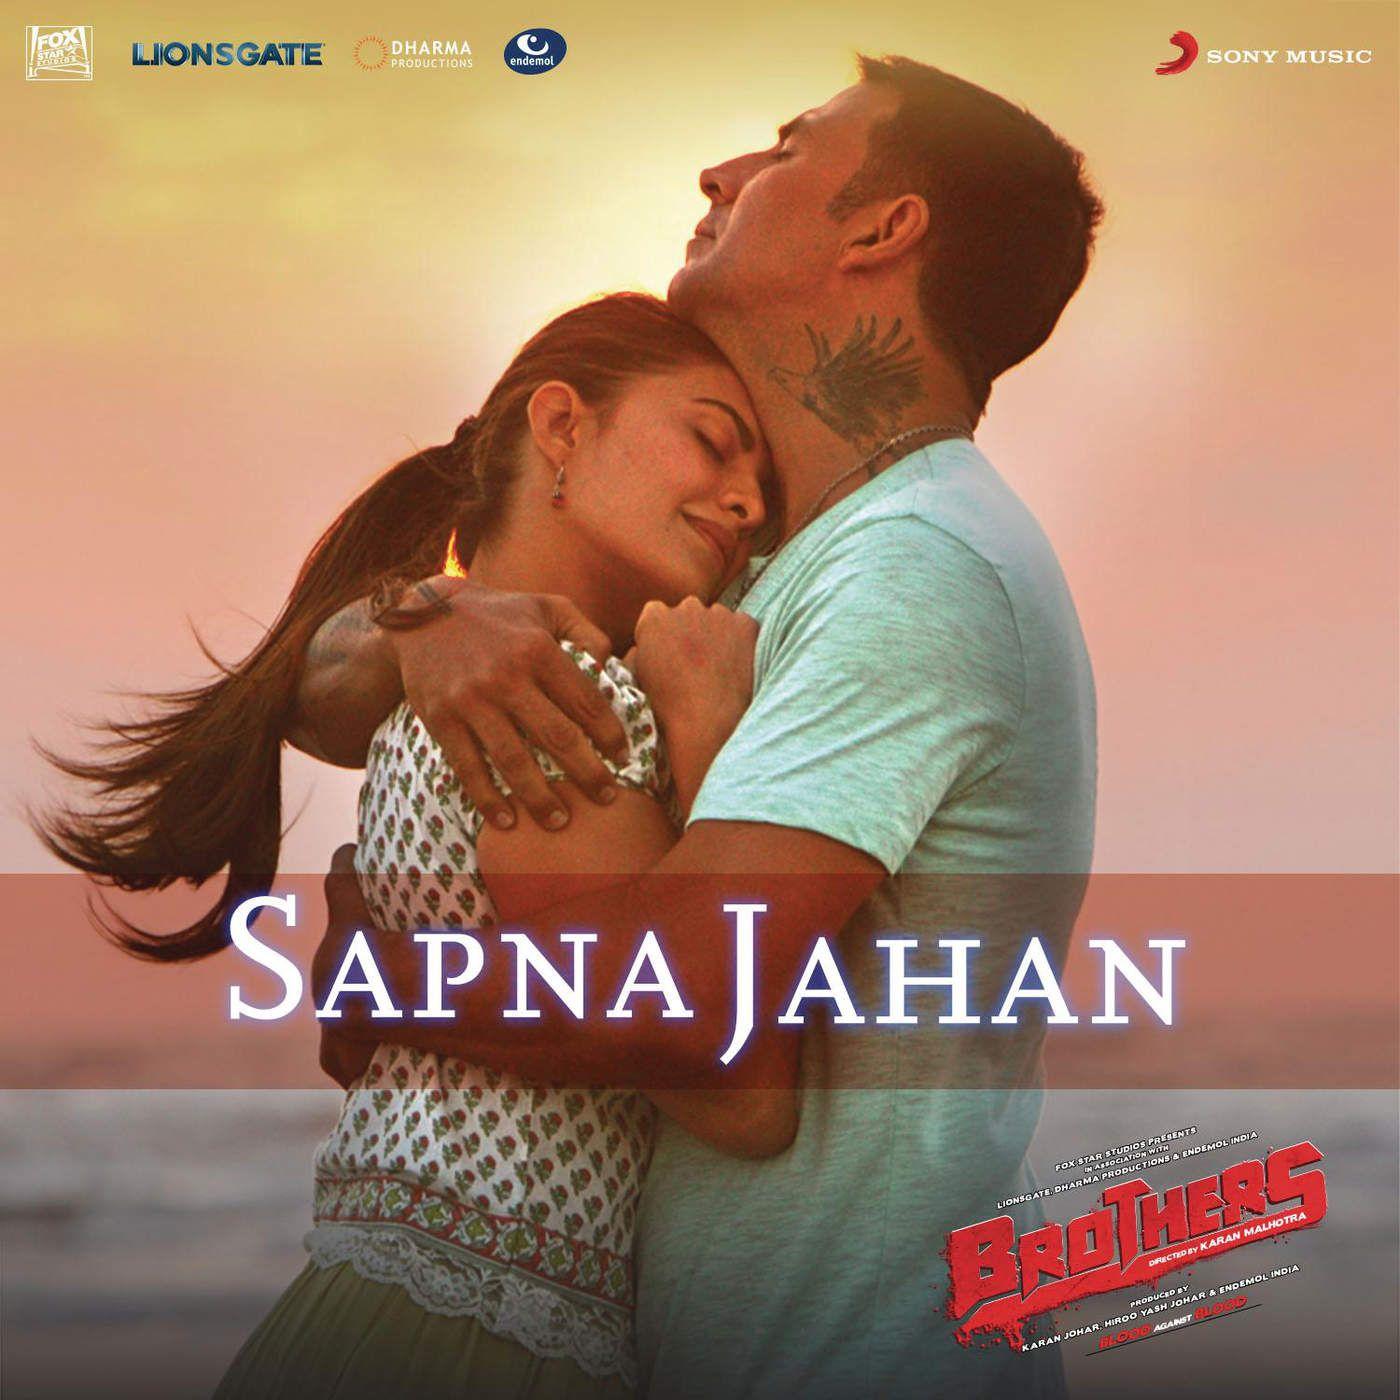 Main Woh Duniya Hai Mp3 Song Download: Sapna Jahan Lyrics - Brothers